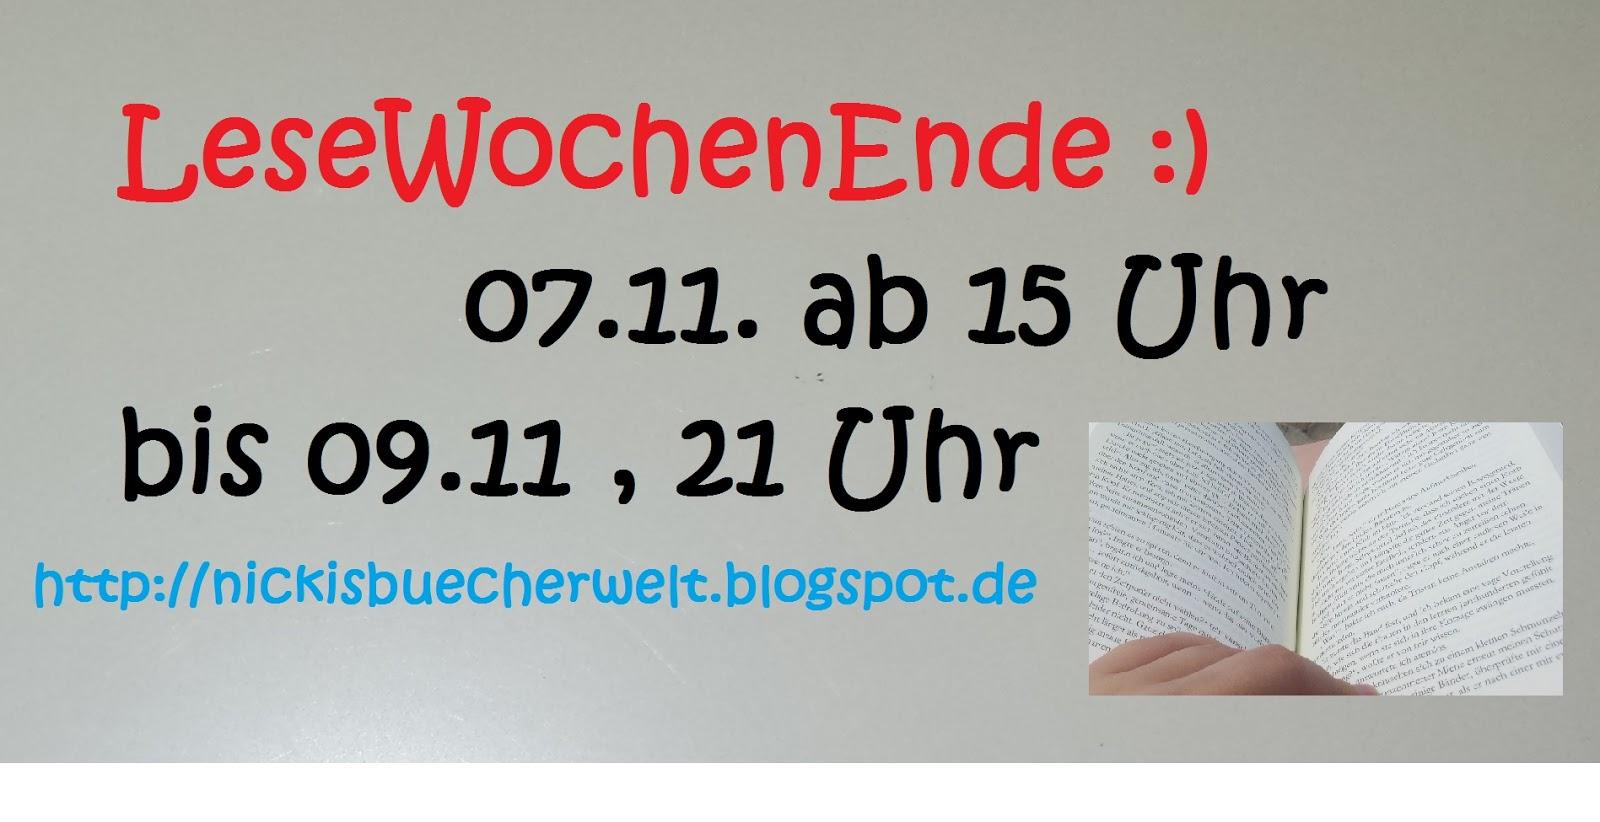 [Lesewochenende] 07.11.14 bis 09.11.14 – Tag #03